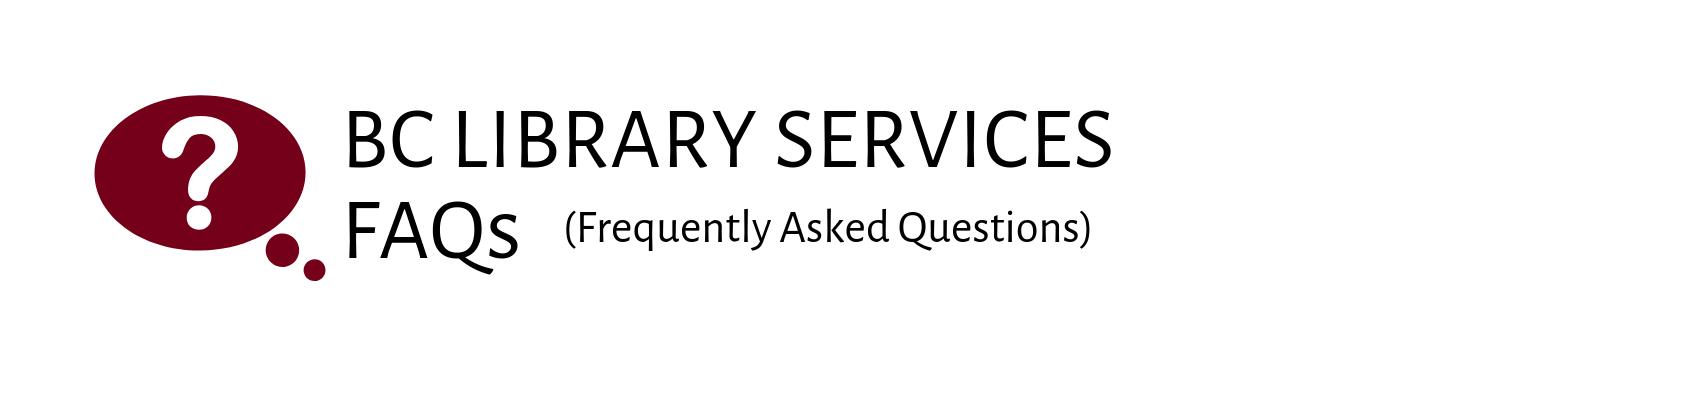 BC Library FAQ